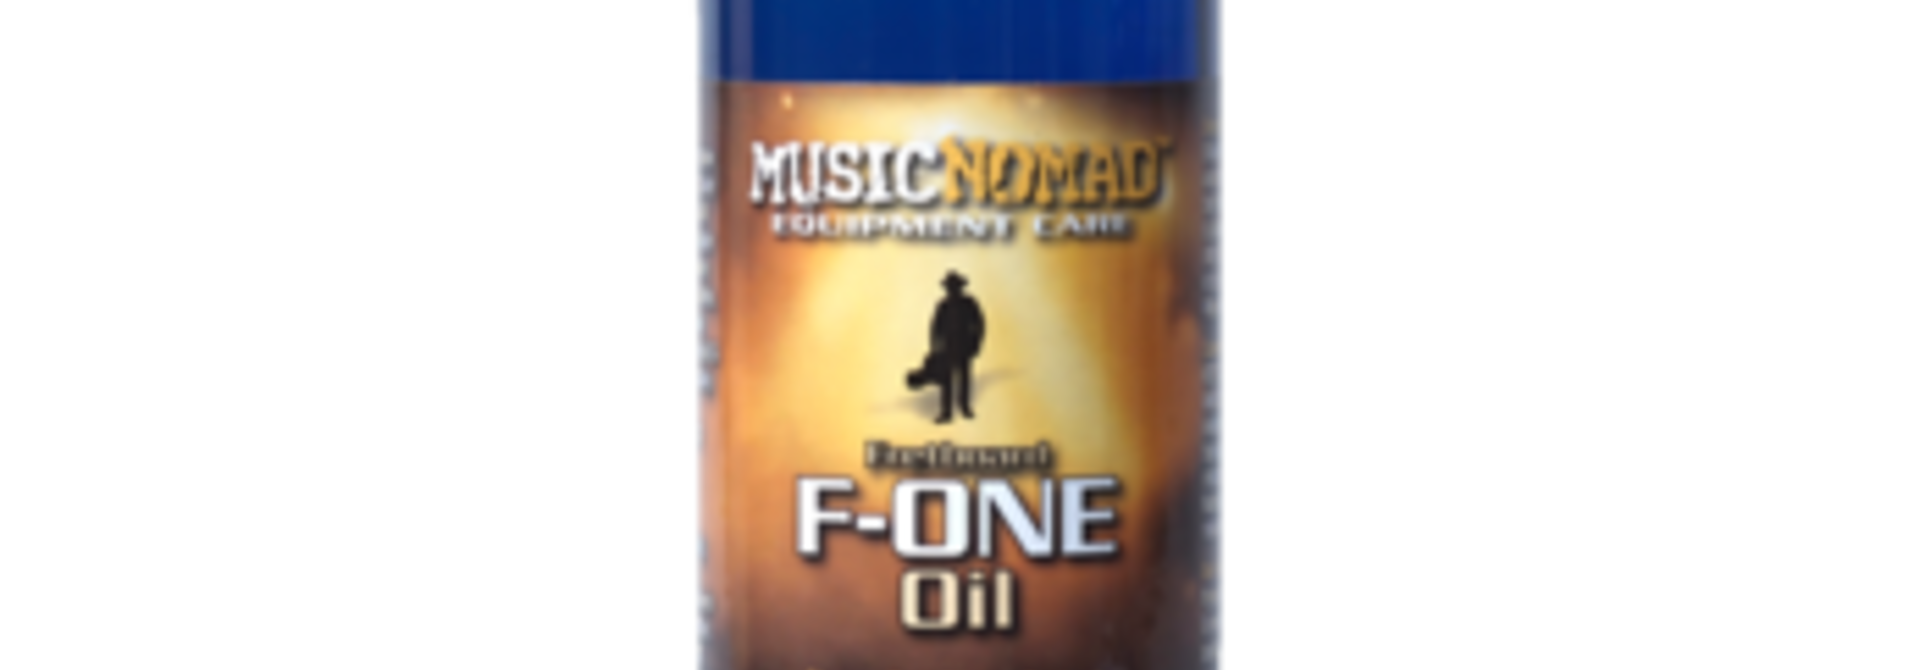 Music Nomad Fretboard F-ONE Oil (Tech Size) 8oz. MN151